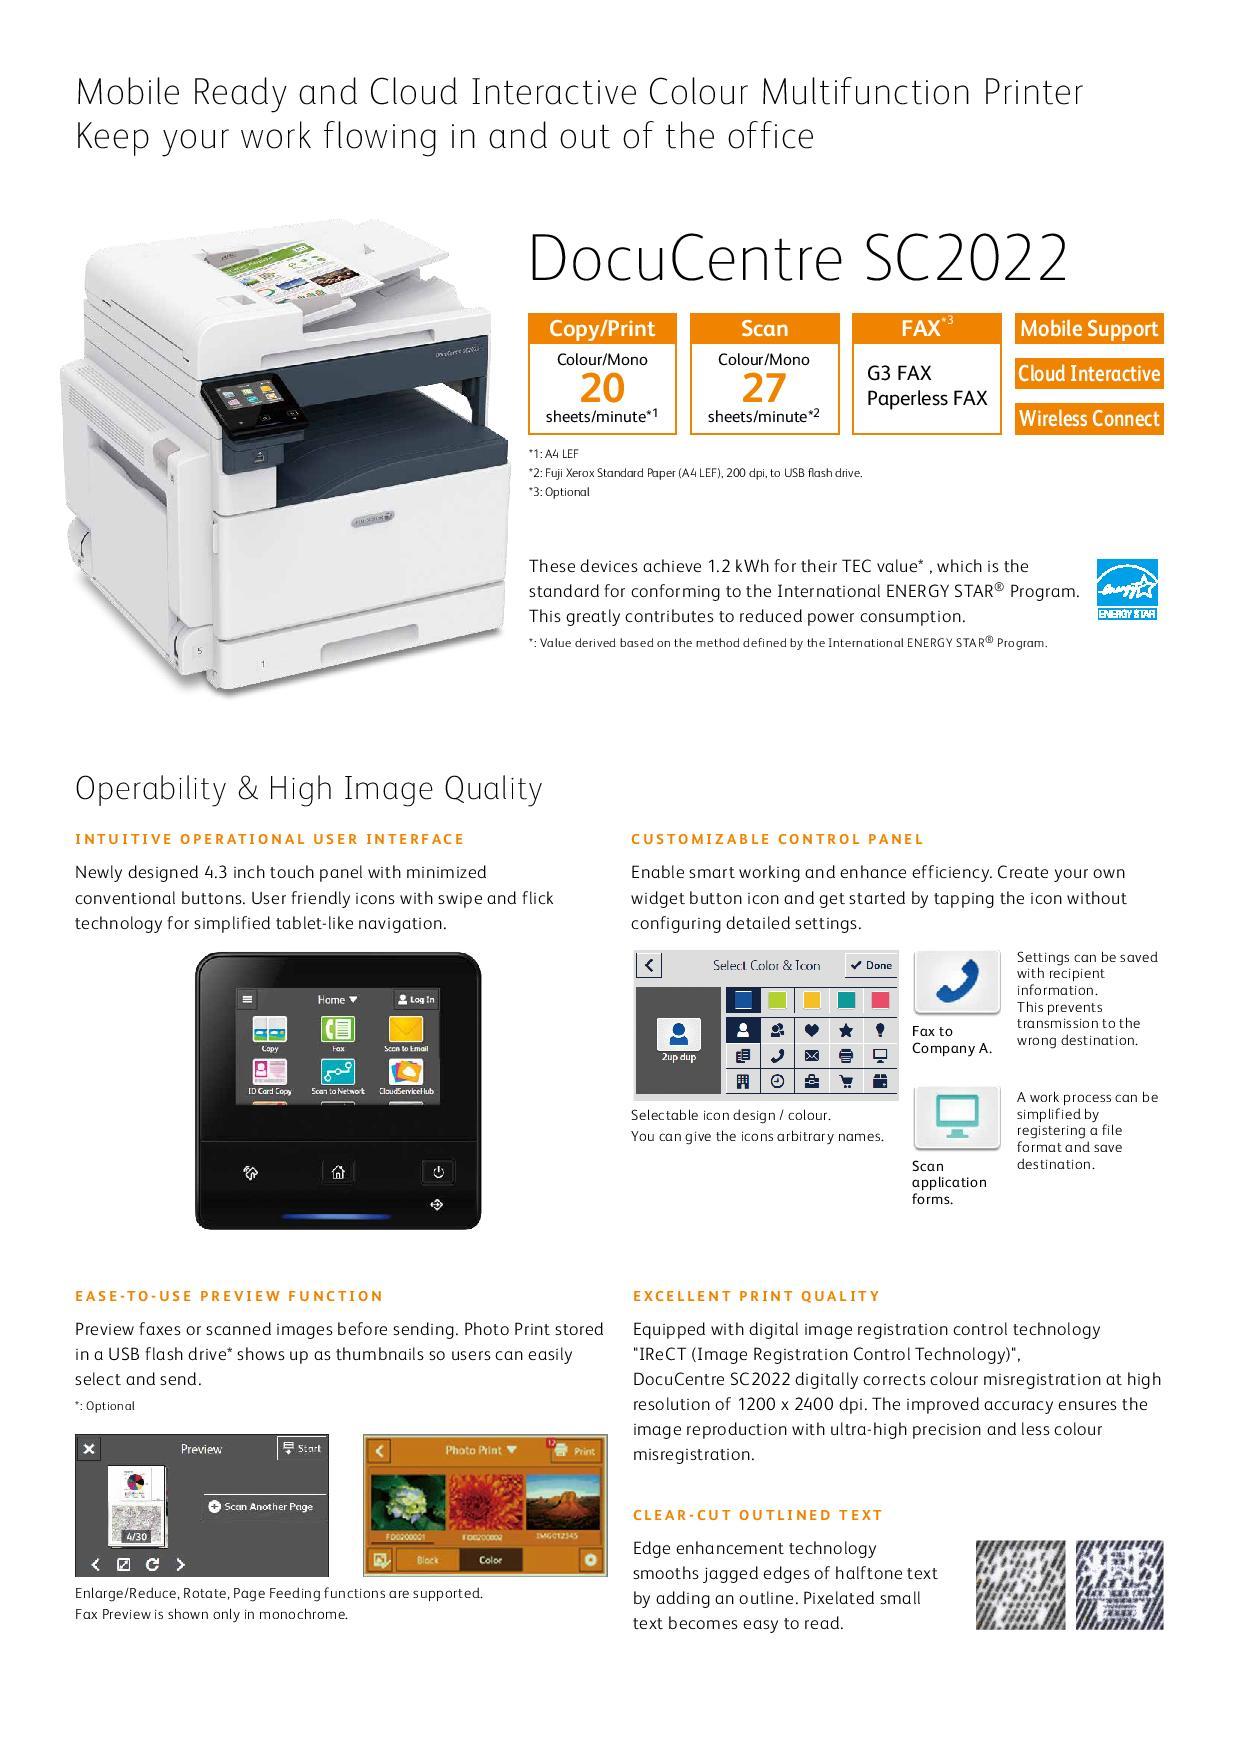 Fuji Xerox DocuCentre SC2022